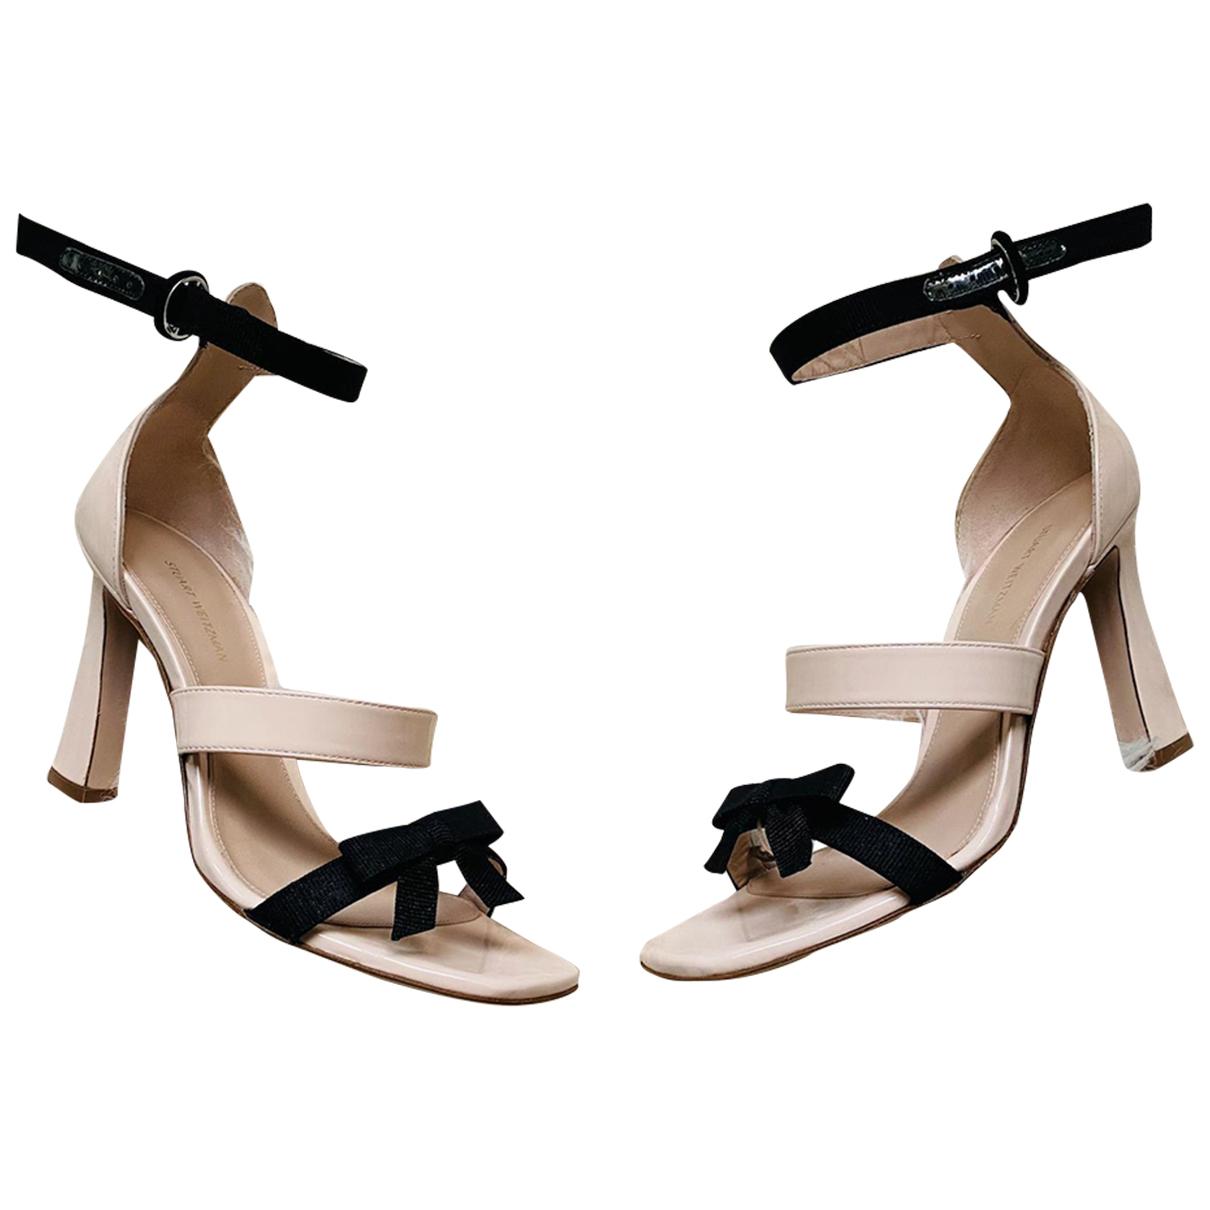 Stuart Weitzman N Beige Leather Sandals for Women 5.5 UK